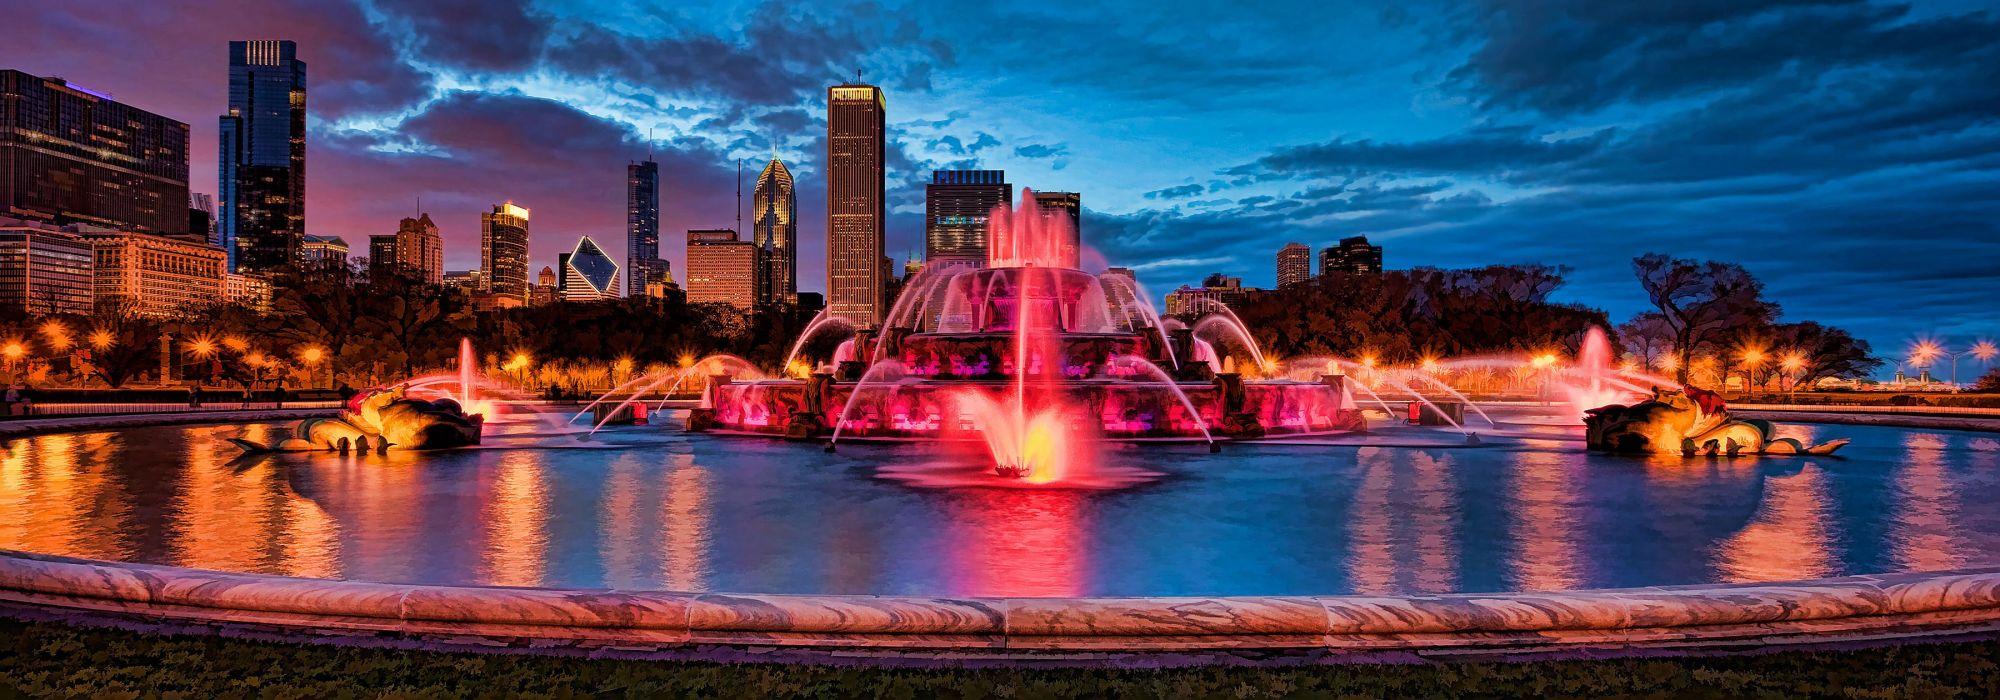 Buckingham Fountain illuminated at dusk Chicago wallpaper